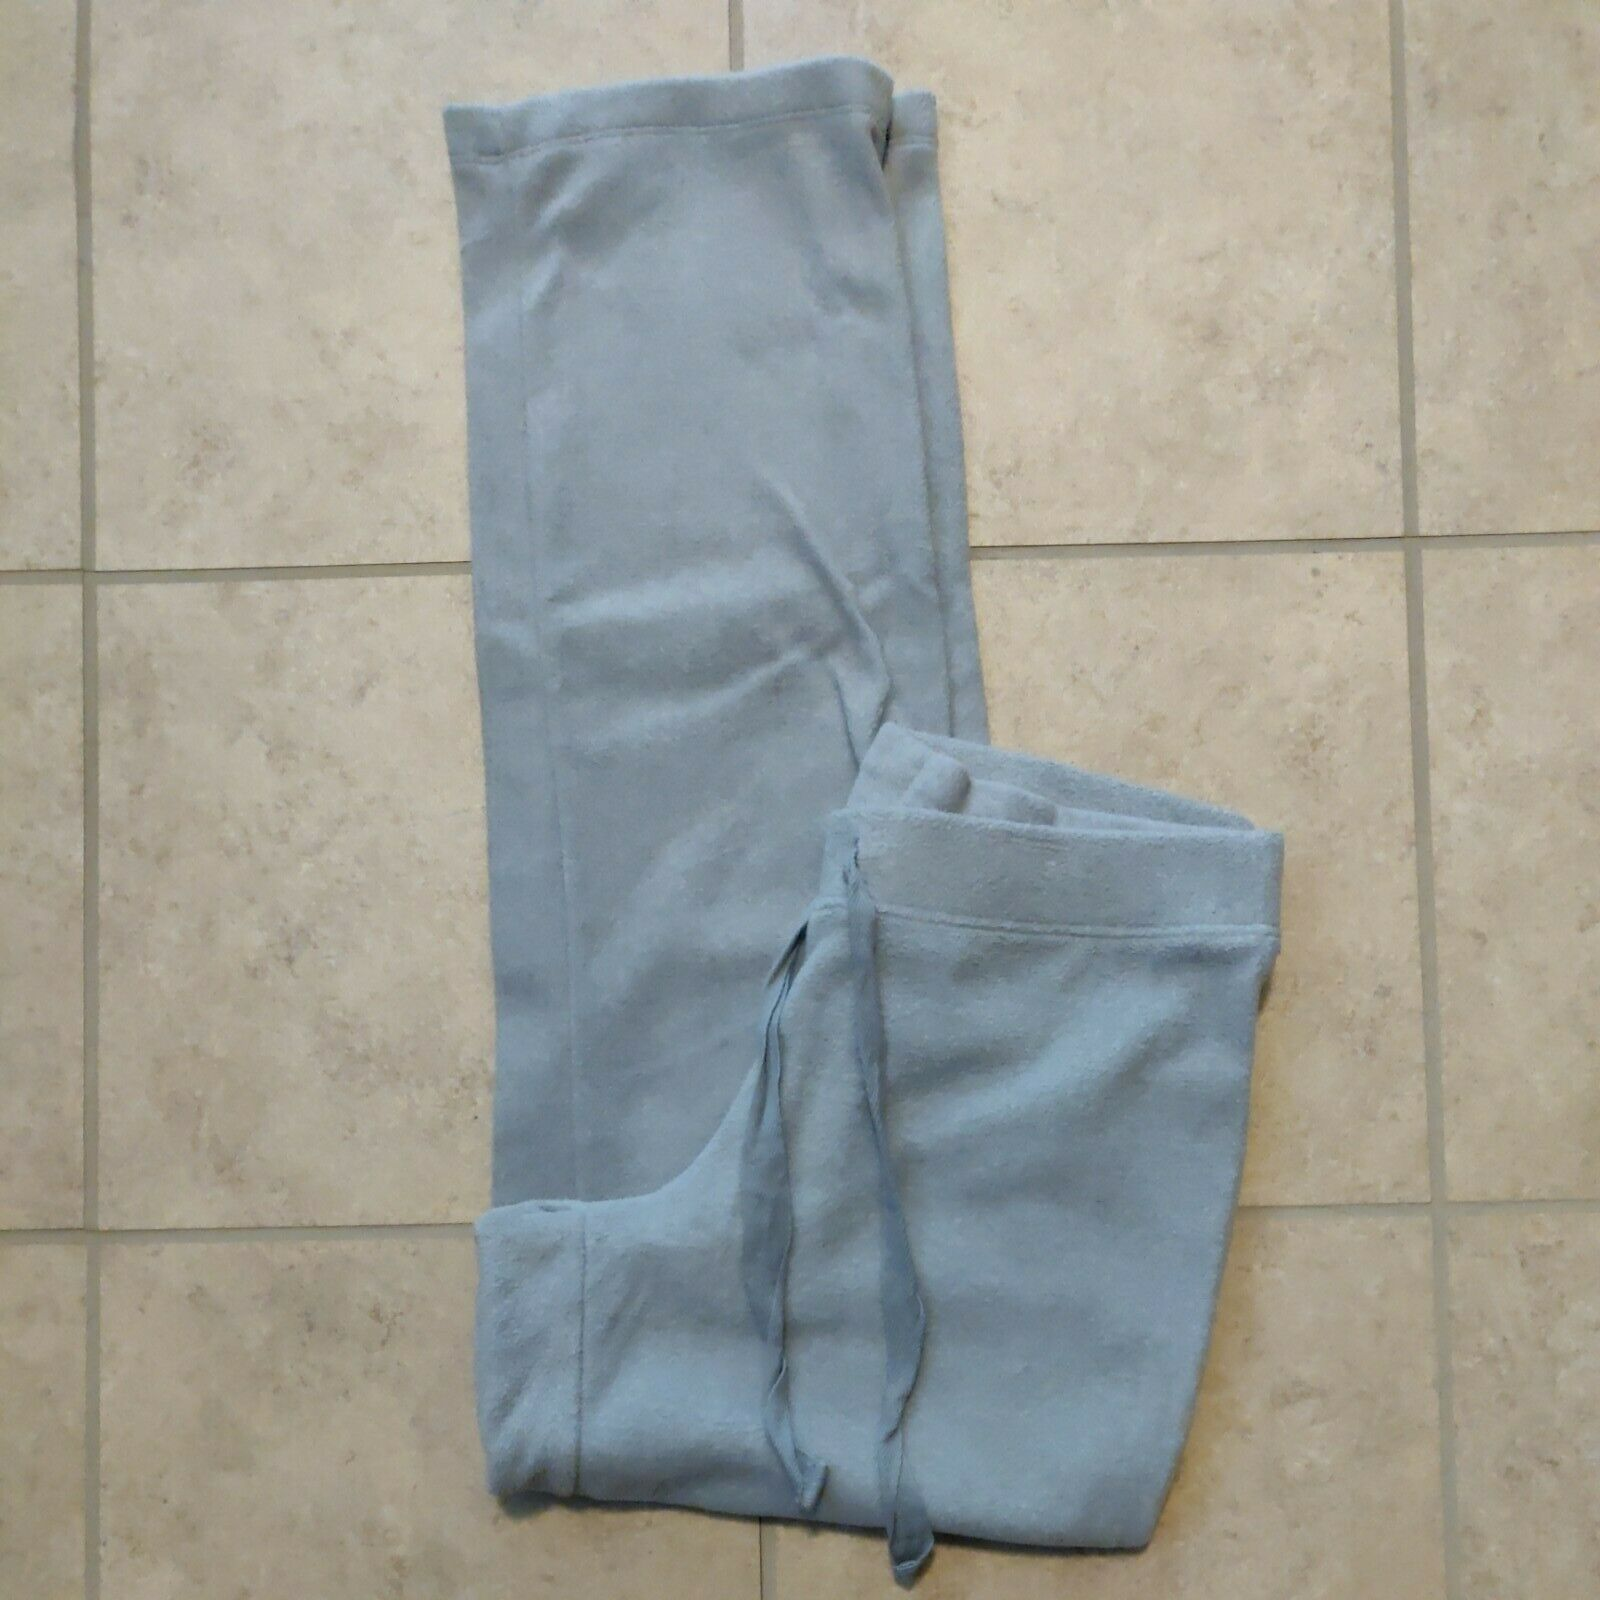 Old Navy women's size S fleece sweatpants light gray pull-on with tie straight